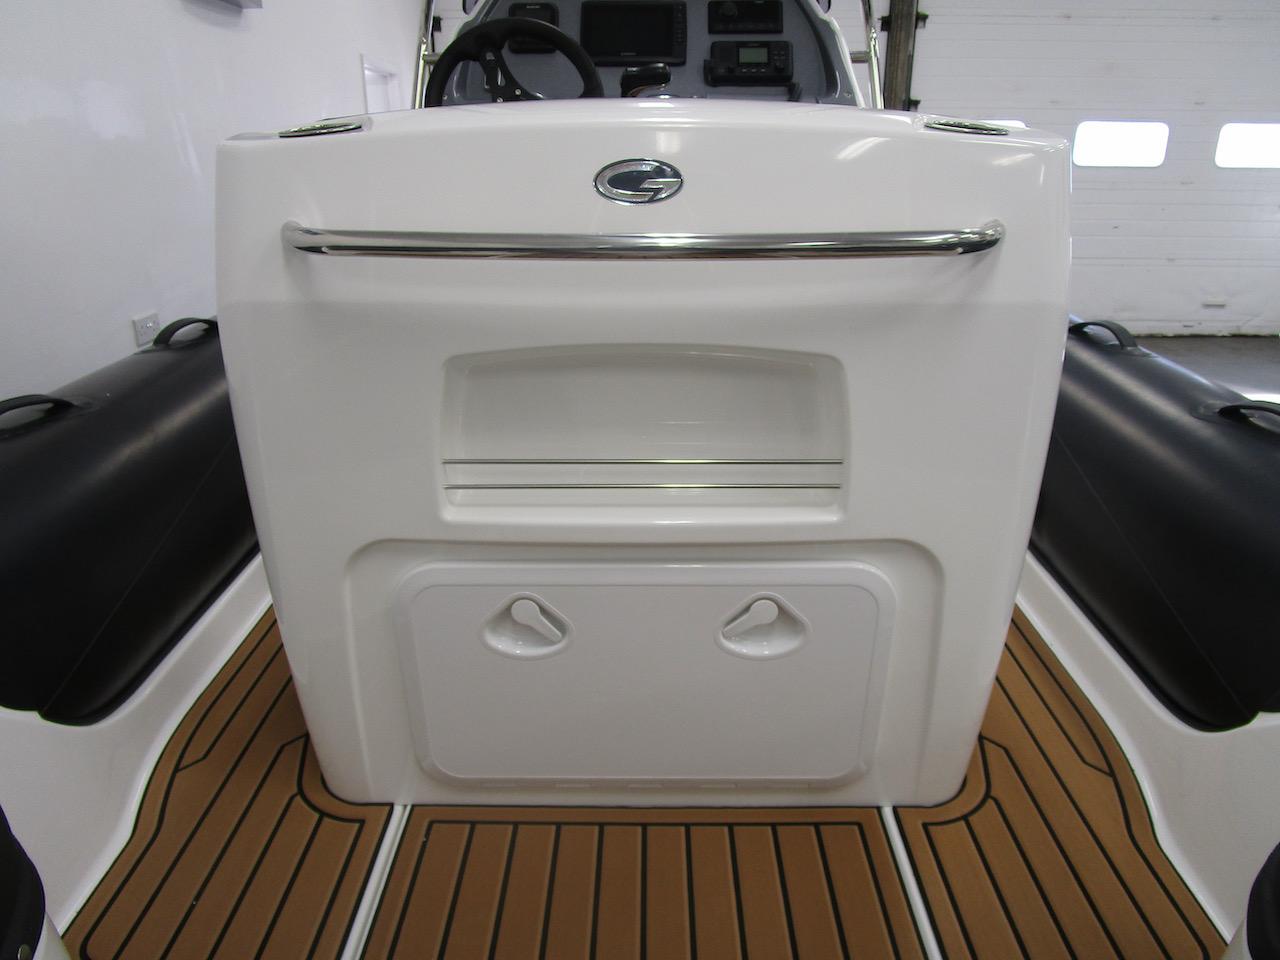 Grand RIB Golden Line G650 rear of helm seat, locker shut